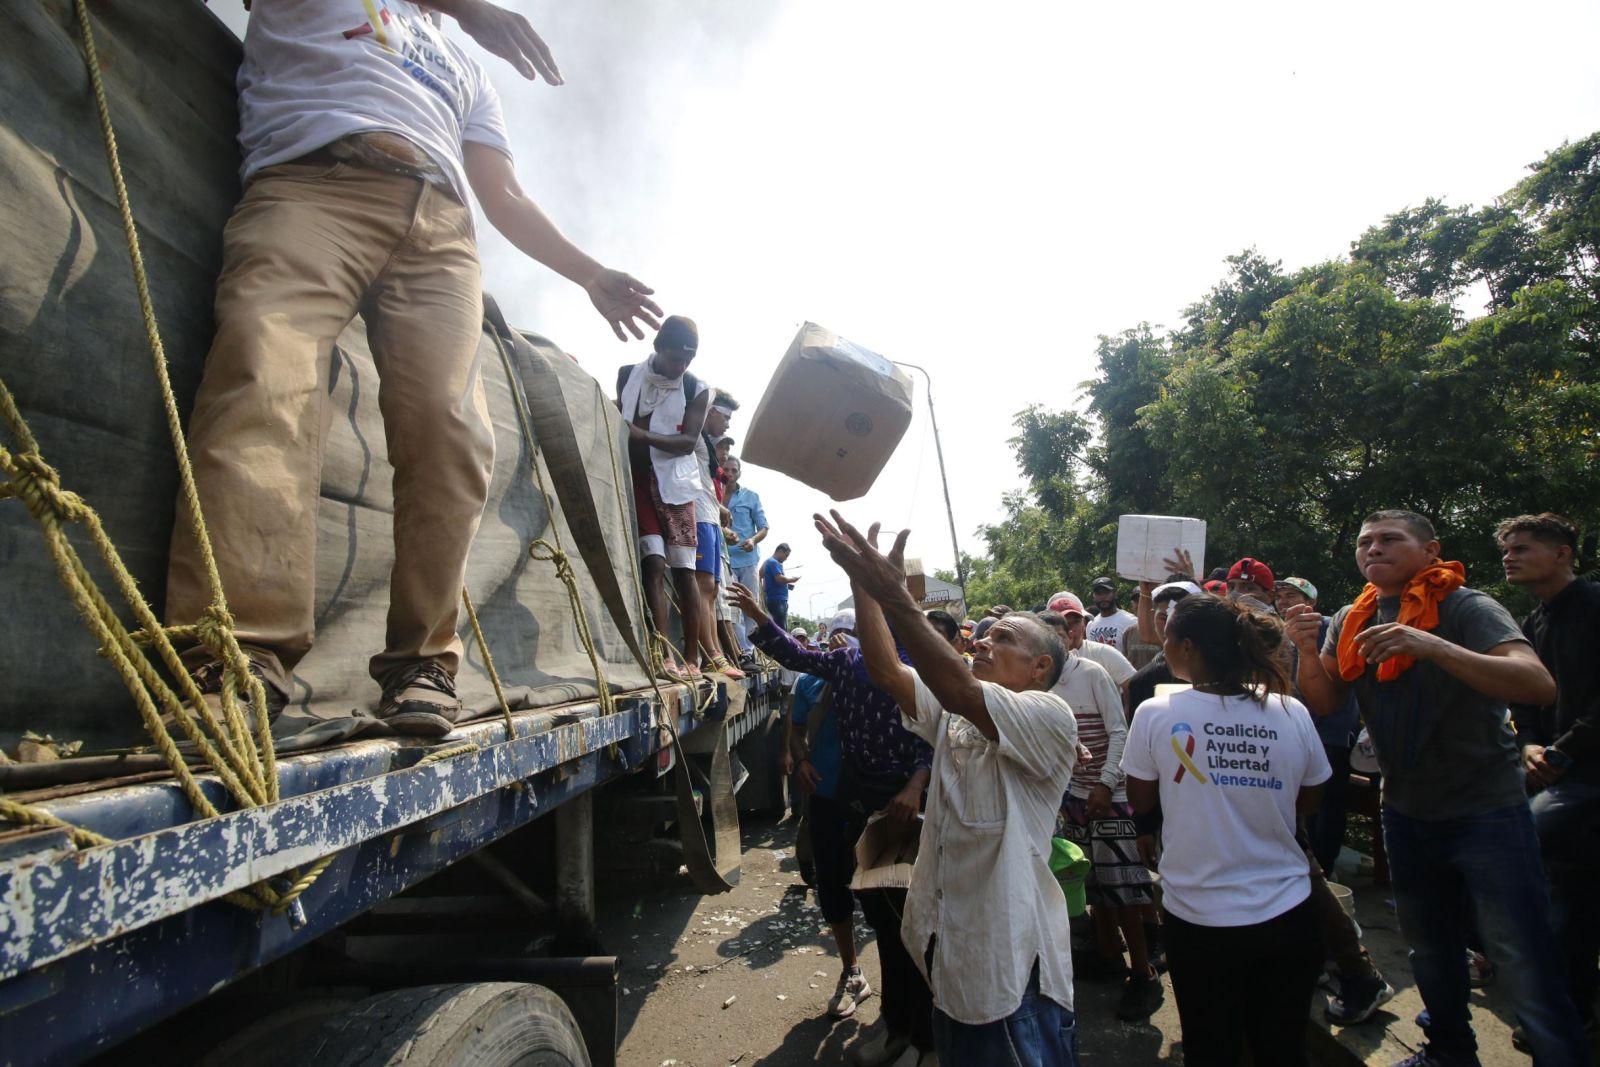 40,000 Dead Thanks to US Sanctions on Venezuela – Study